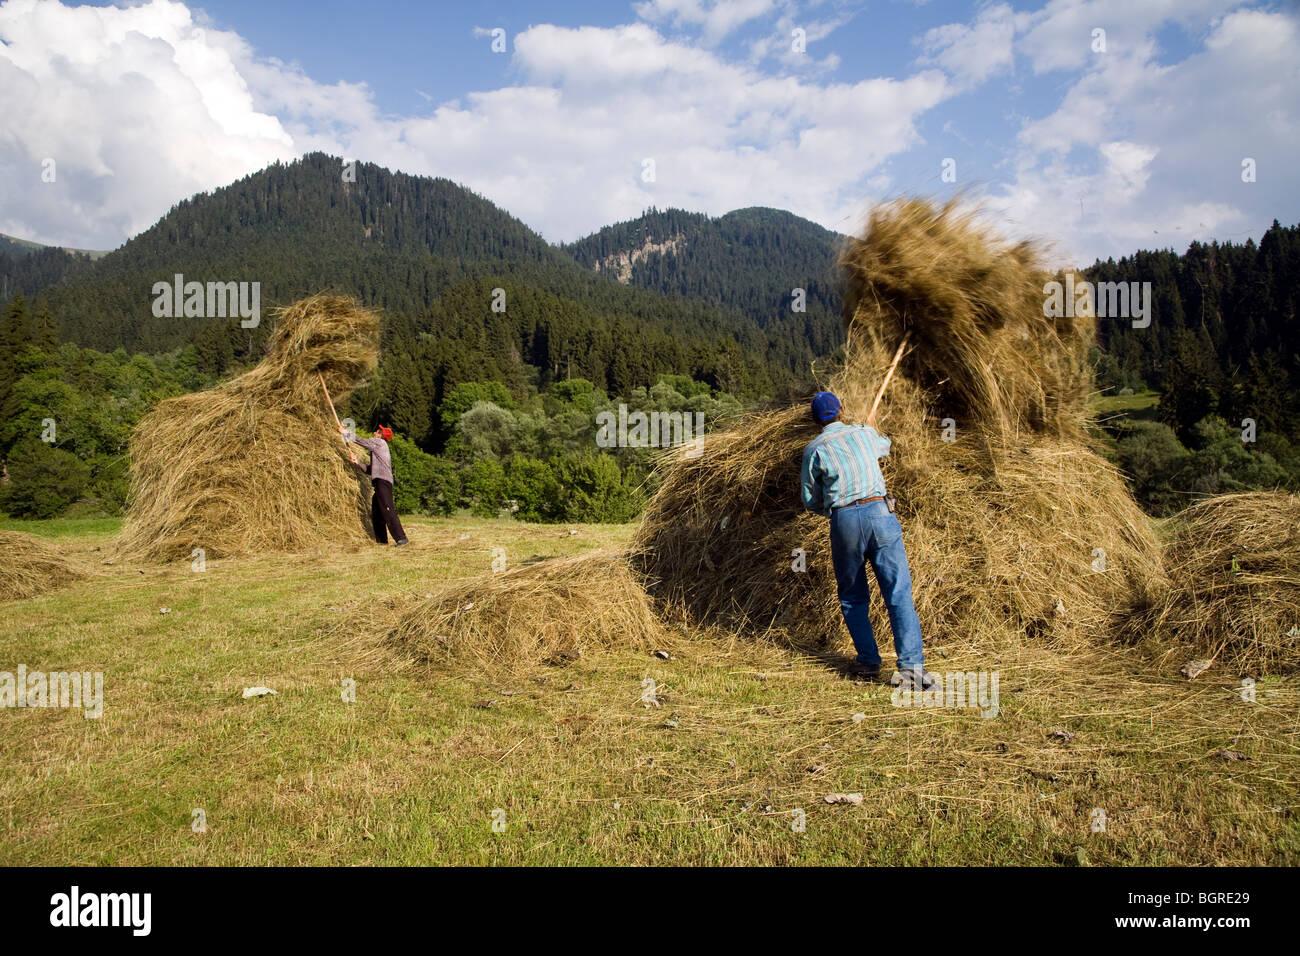 Hay storing for winter, Ardanuc Artvin Turkey - Stock Image